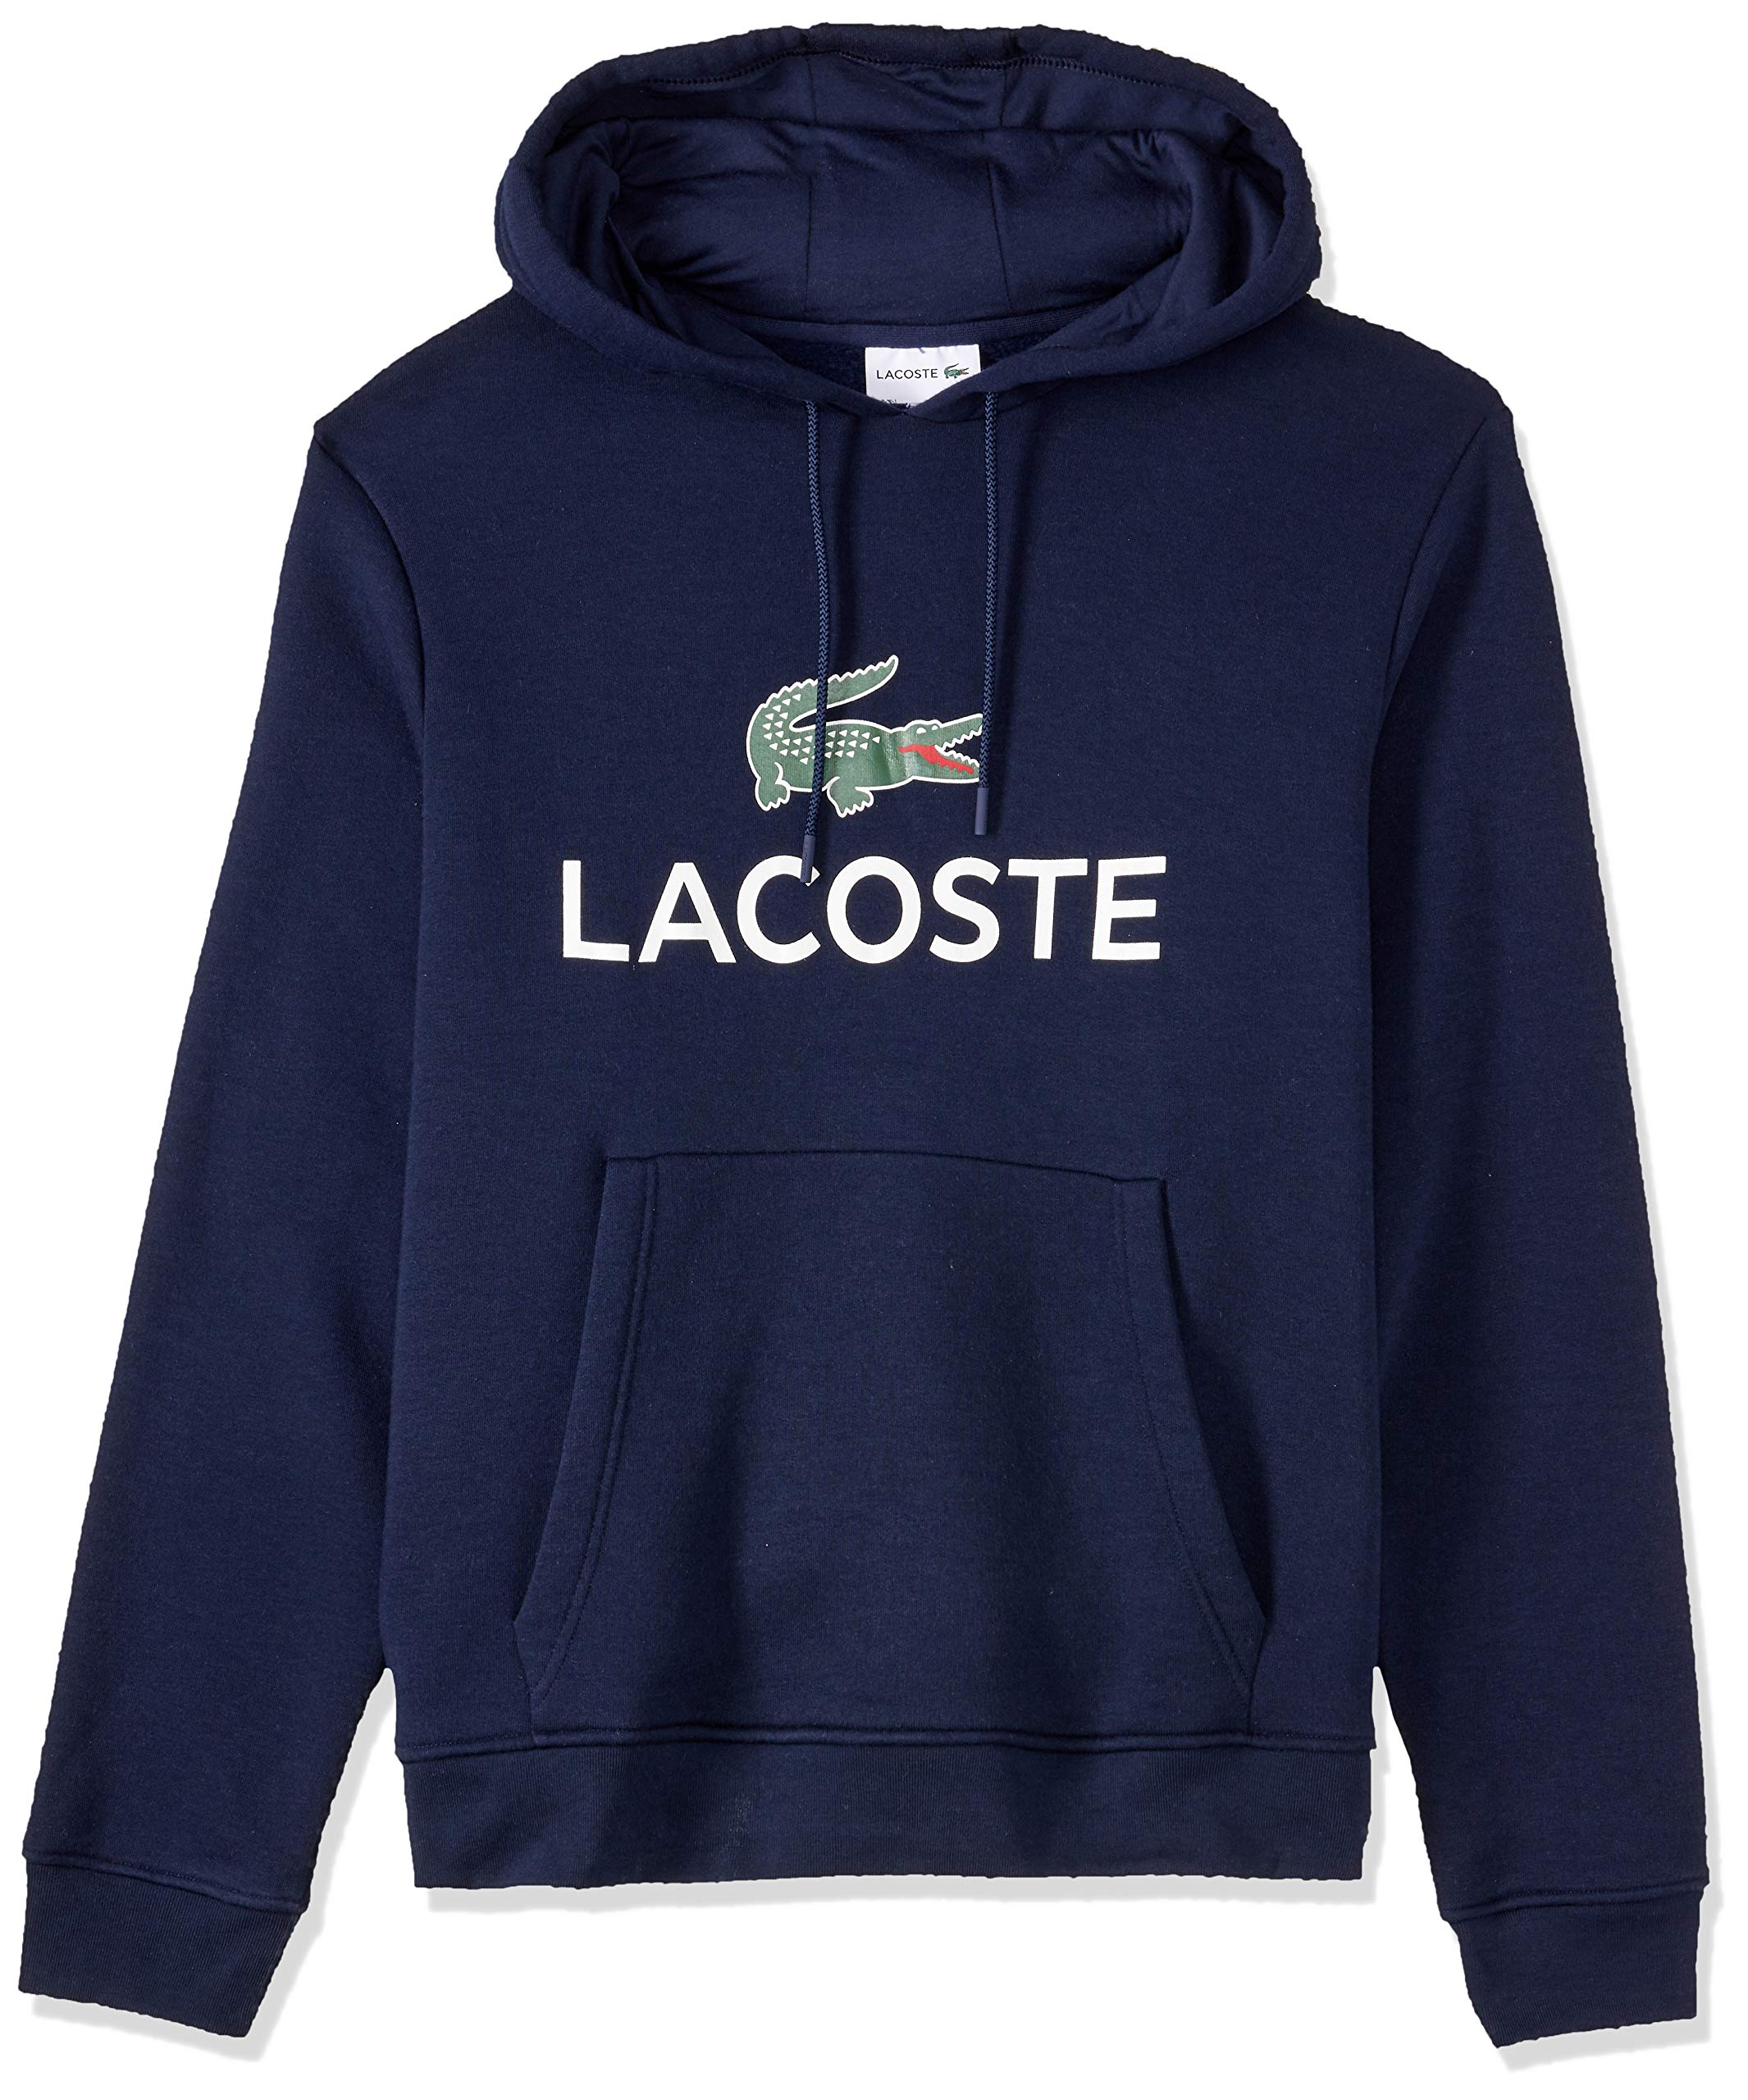 Lacoste Men's Hooded Logo Pullover